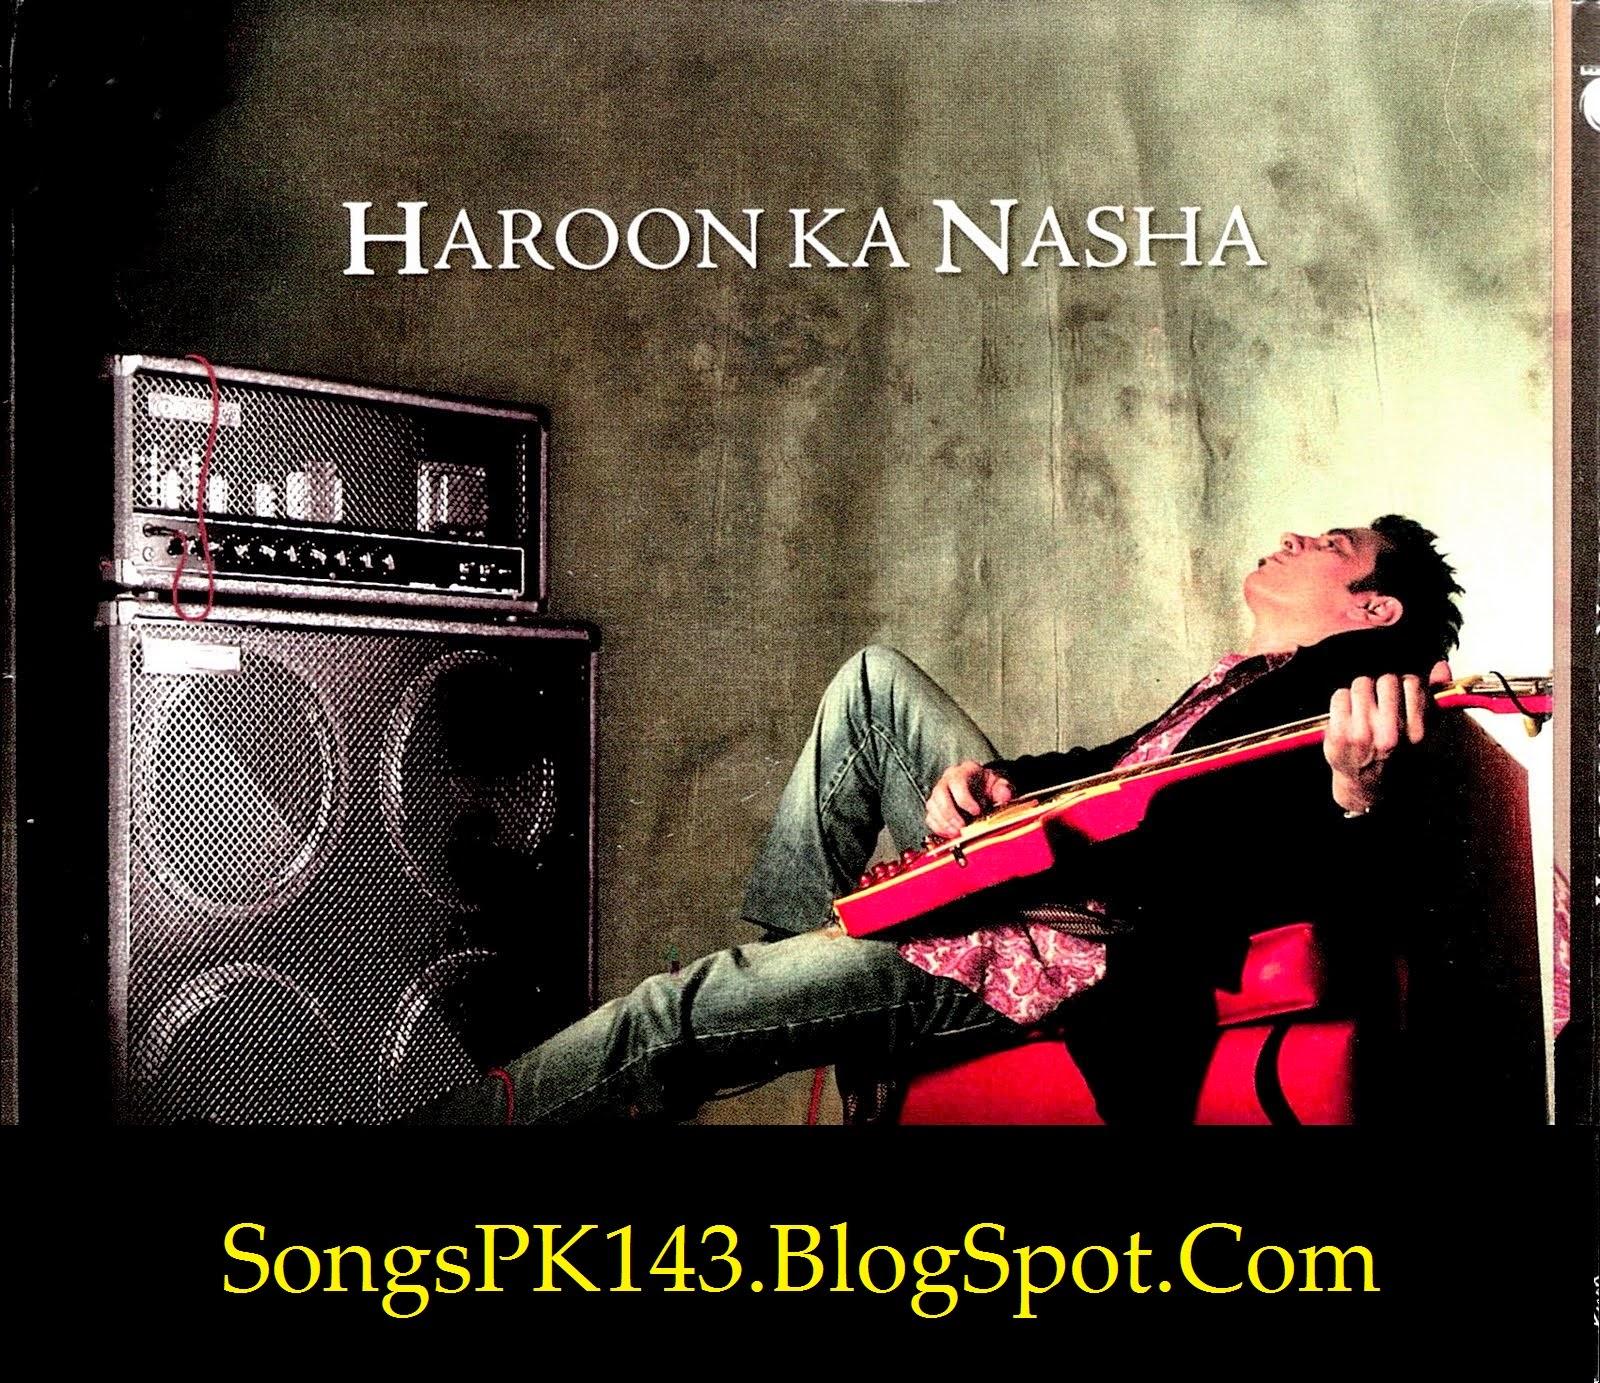 Ab To Aadat Si Hai Mujhko Song kbps Video Music Download - WOMUSIC